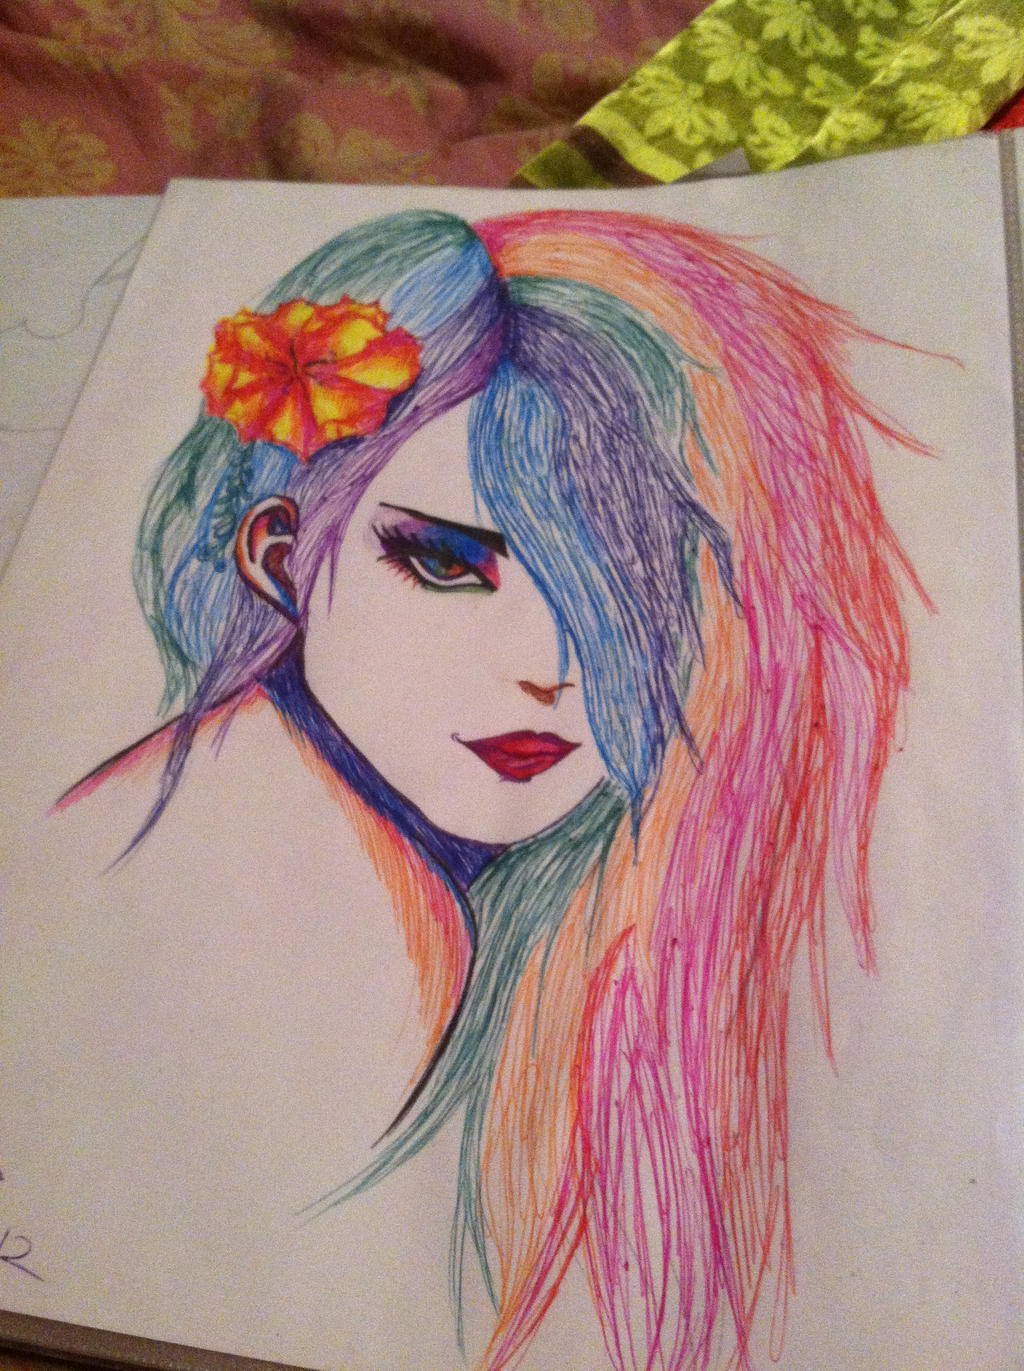 Humanized Rainbow Dash by xXXxNightShadexXXx